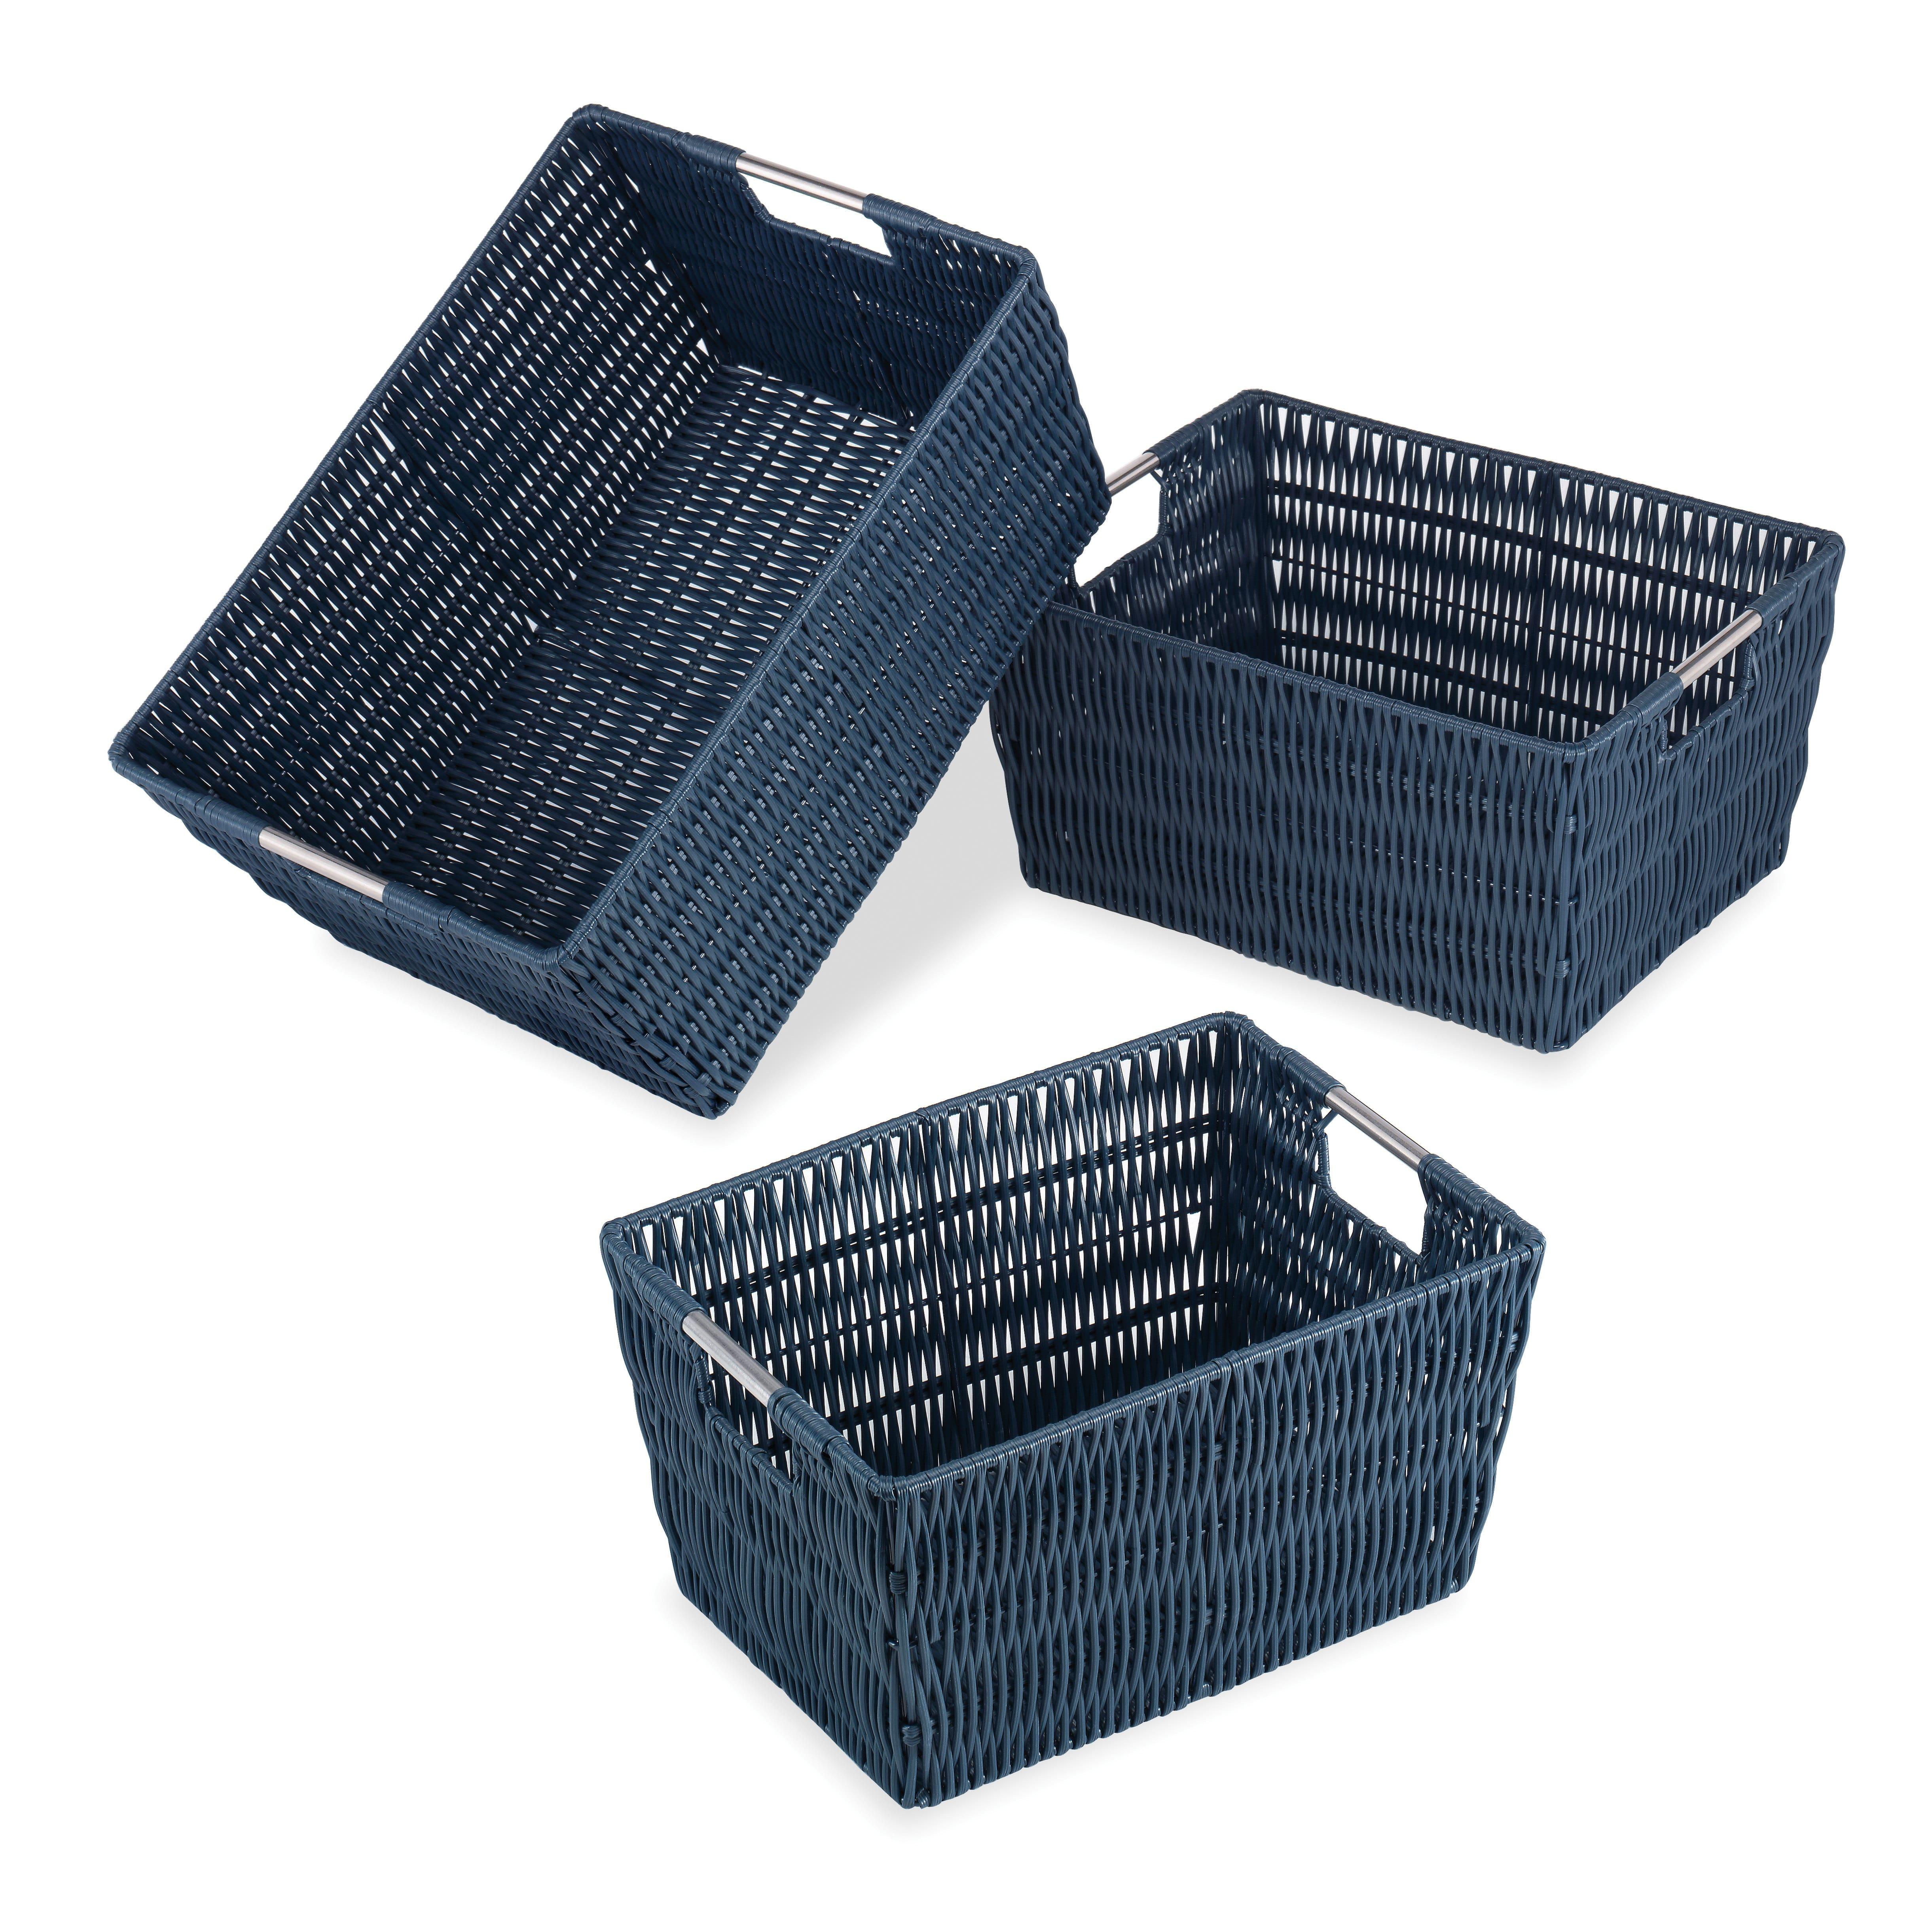 Genial Whitmor Navy Rattique Basket Set. Img